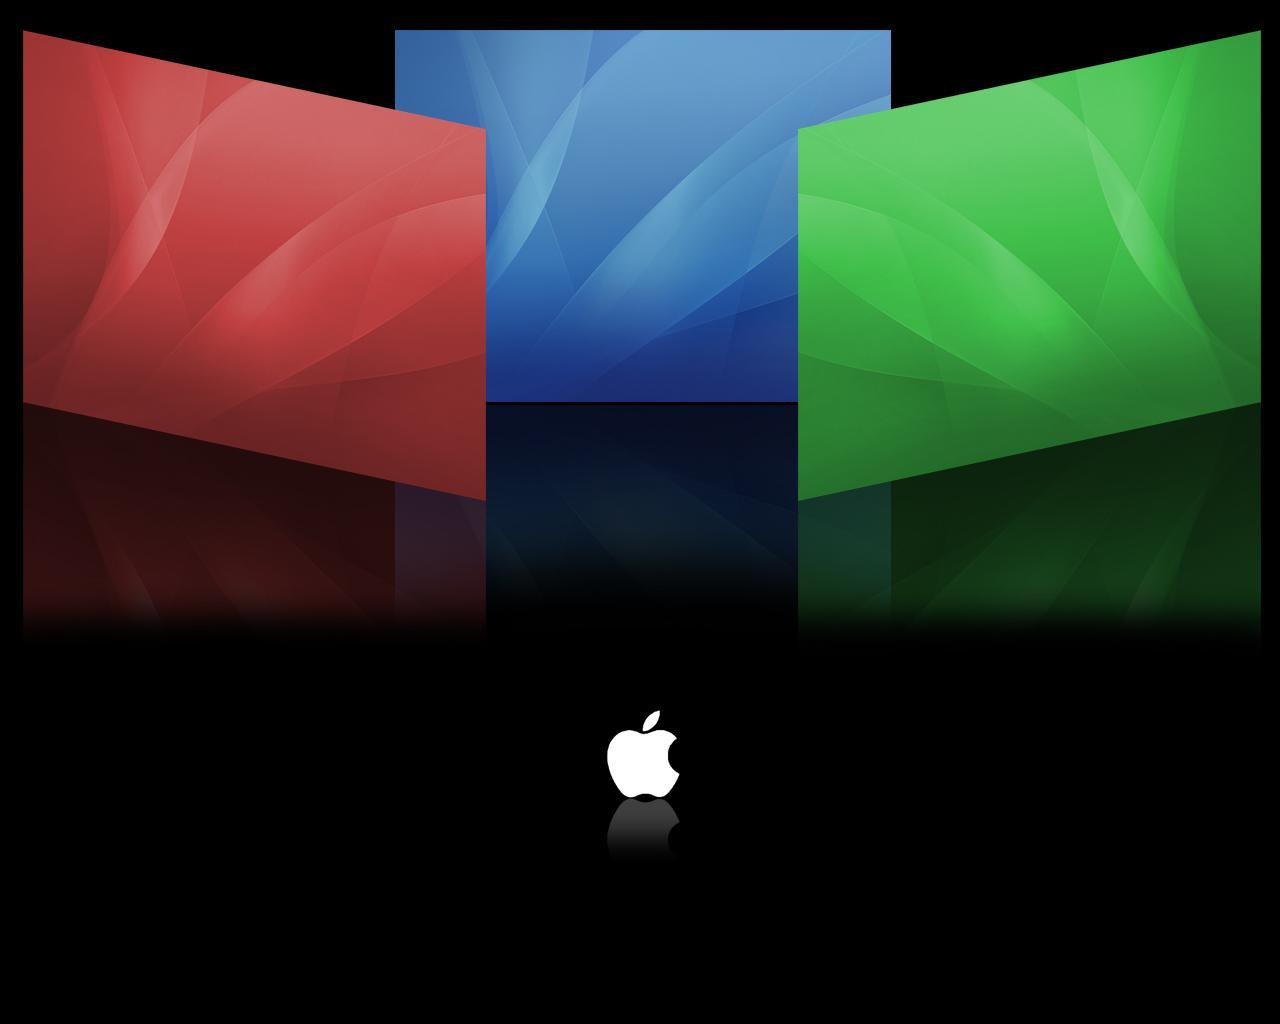 【Windows7壁纸】1280x1024高清壁纸 苹果主题